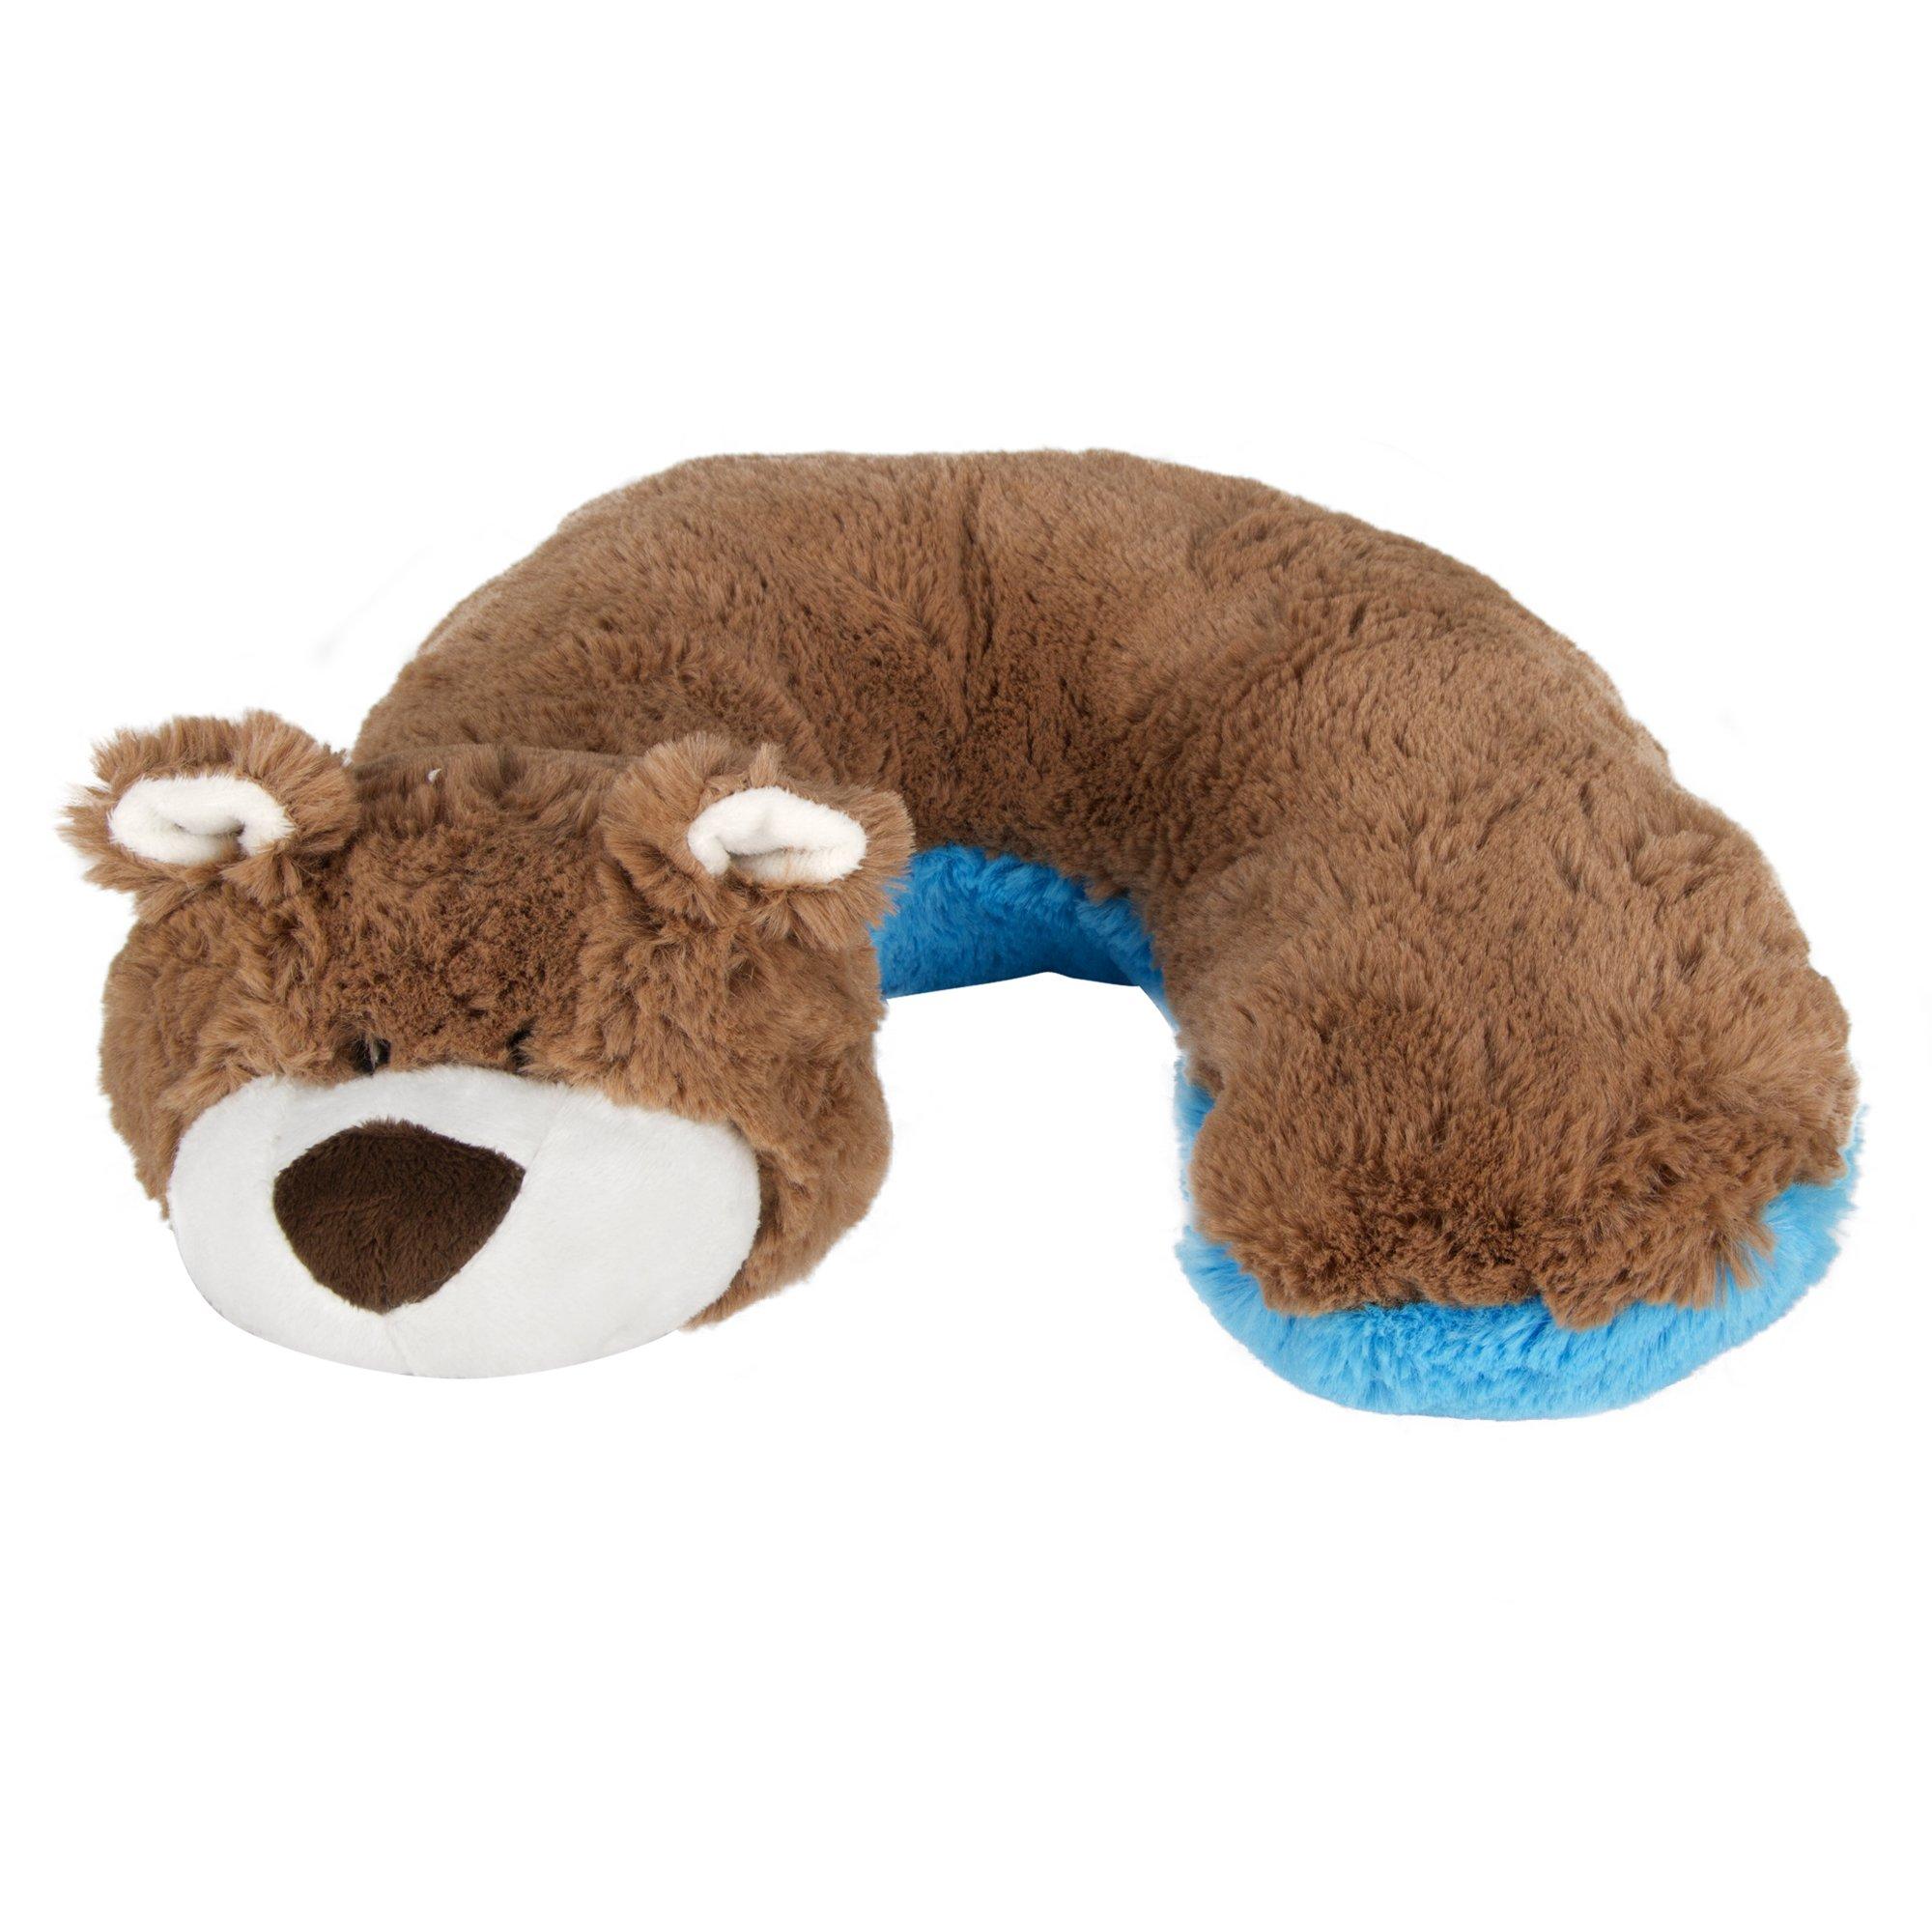 Amazon.com: Animal Planet Travel Pillow for Kids, Giraffe: Baby